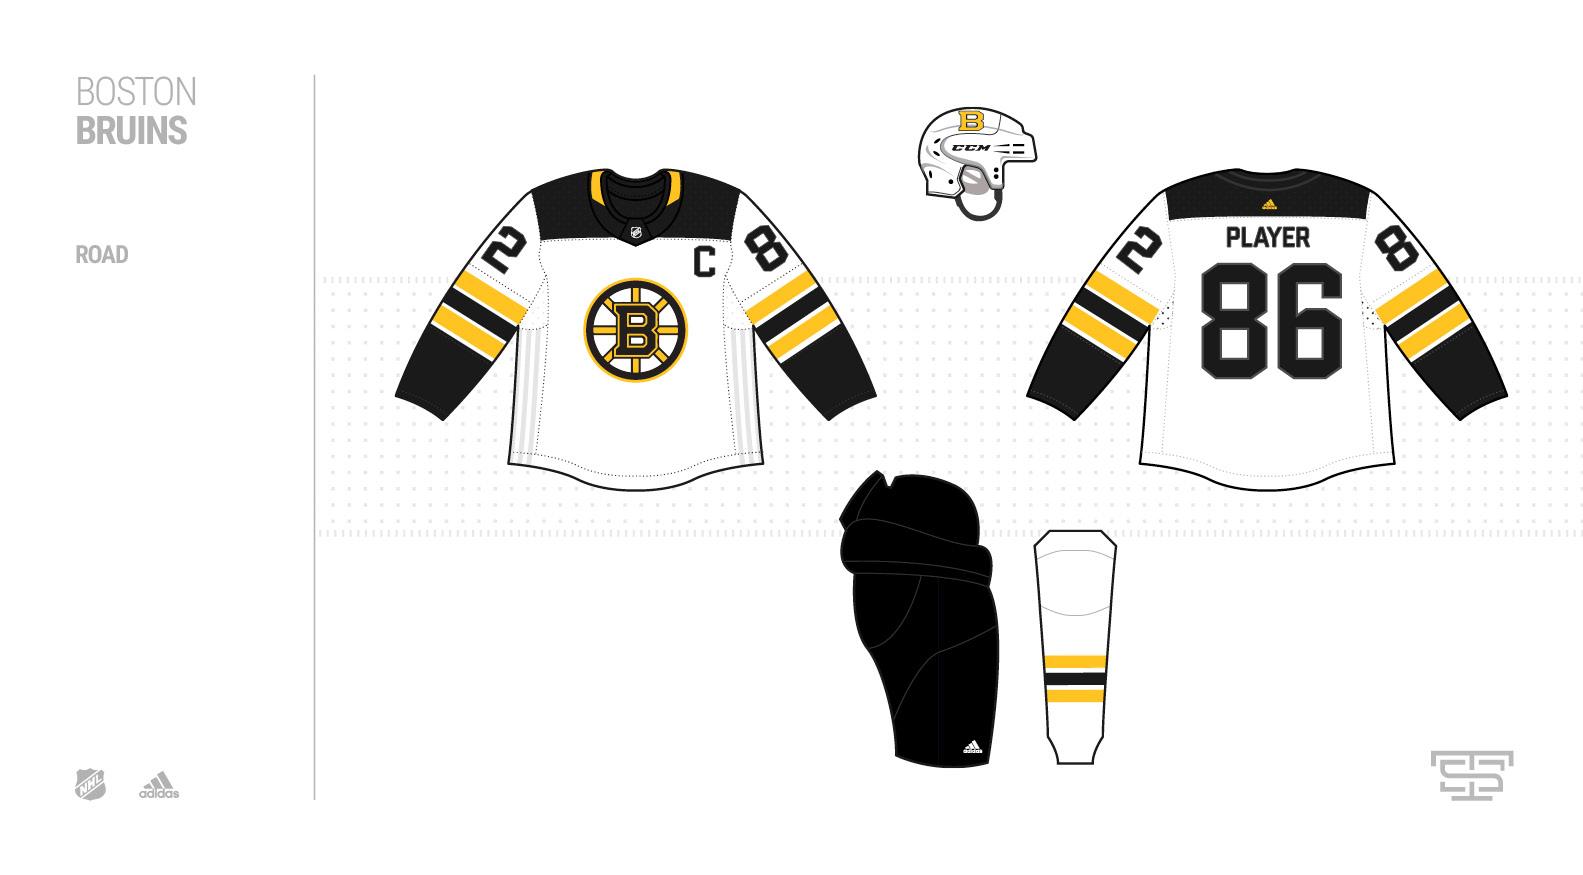 bce51120e12 Adidas NHL Jersey Concepts - Concepts - Chris Creamer's Sports Logos ...